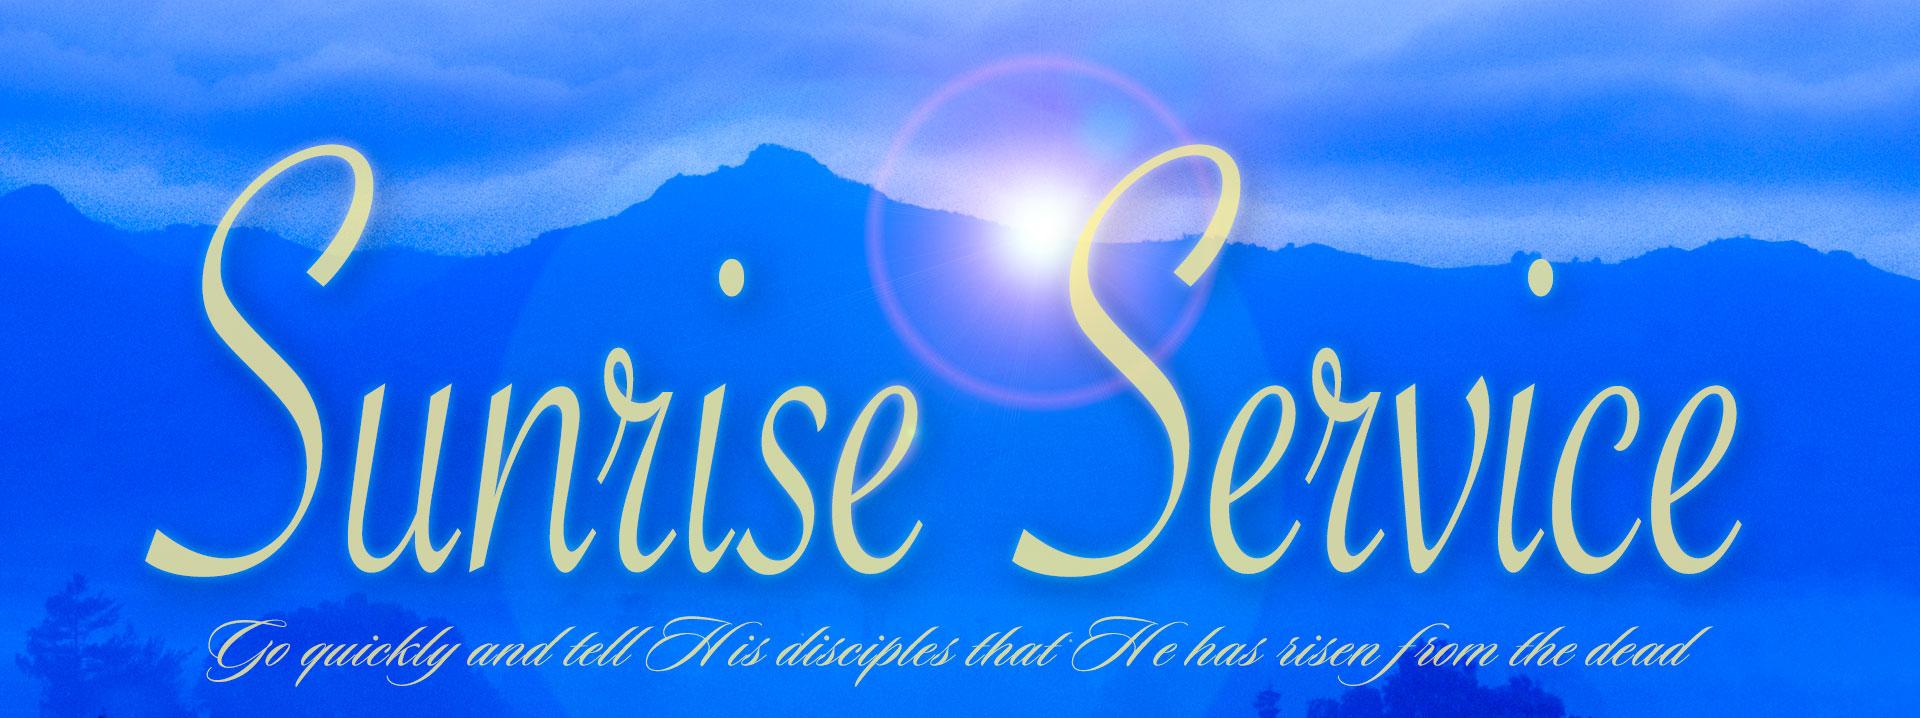 Grace Bible Church of Hollister Sunrise Service - Grace ...